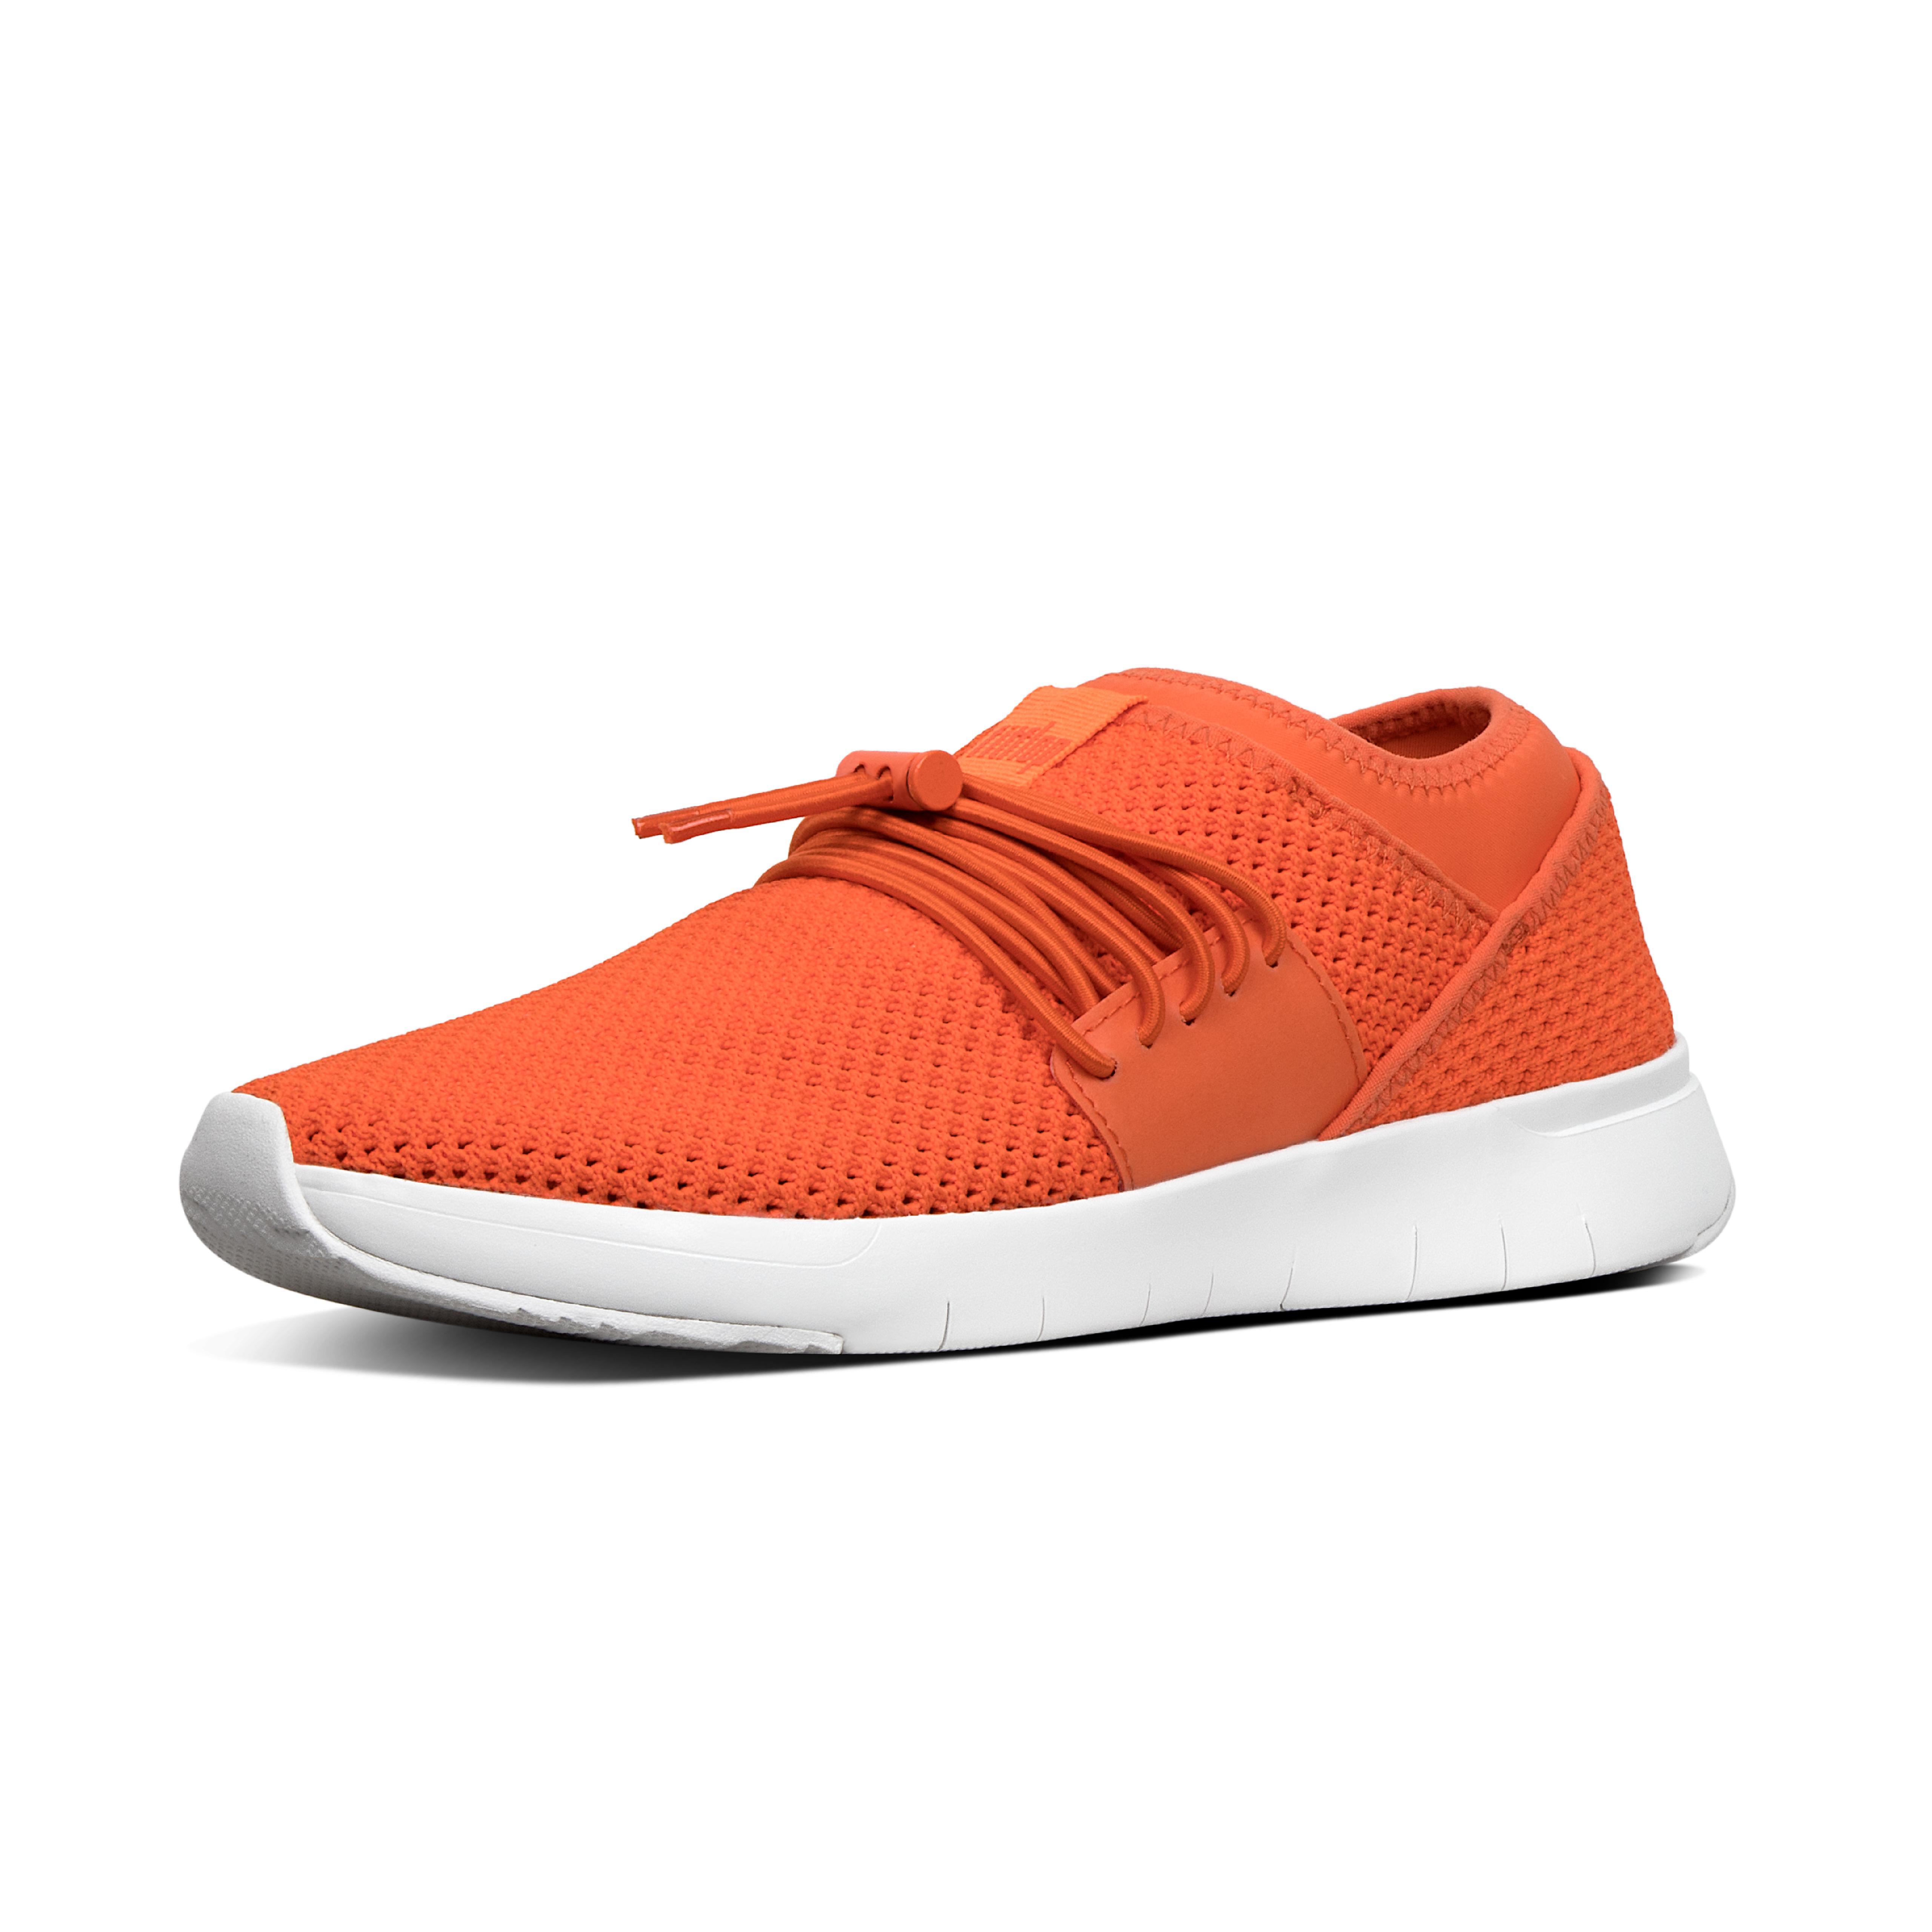 Airmesh lace up sneaker neon orange r64 694?v=3